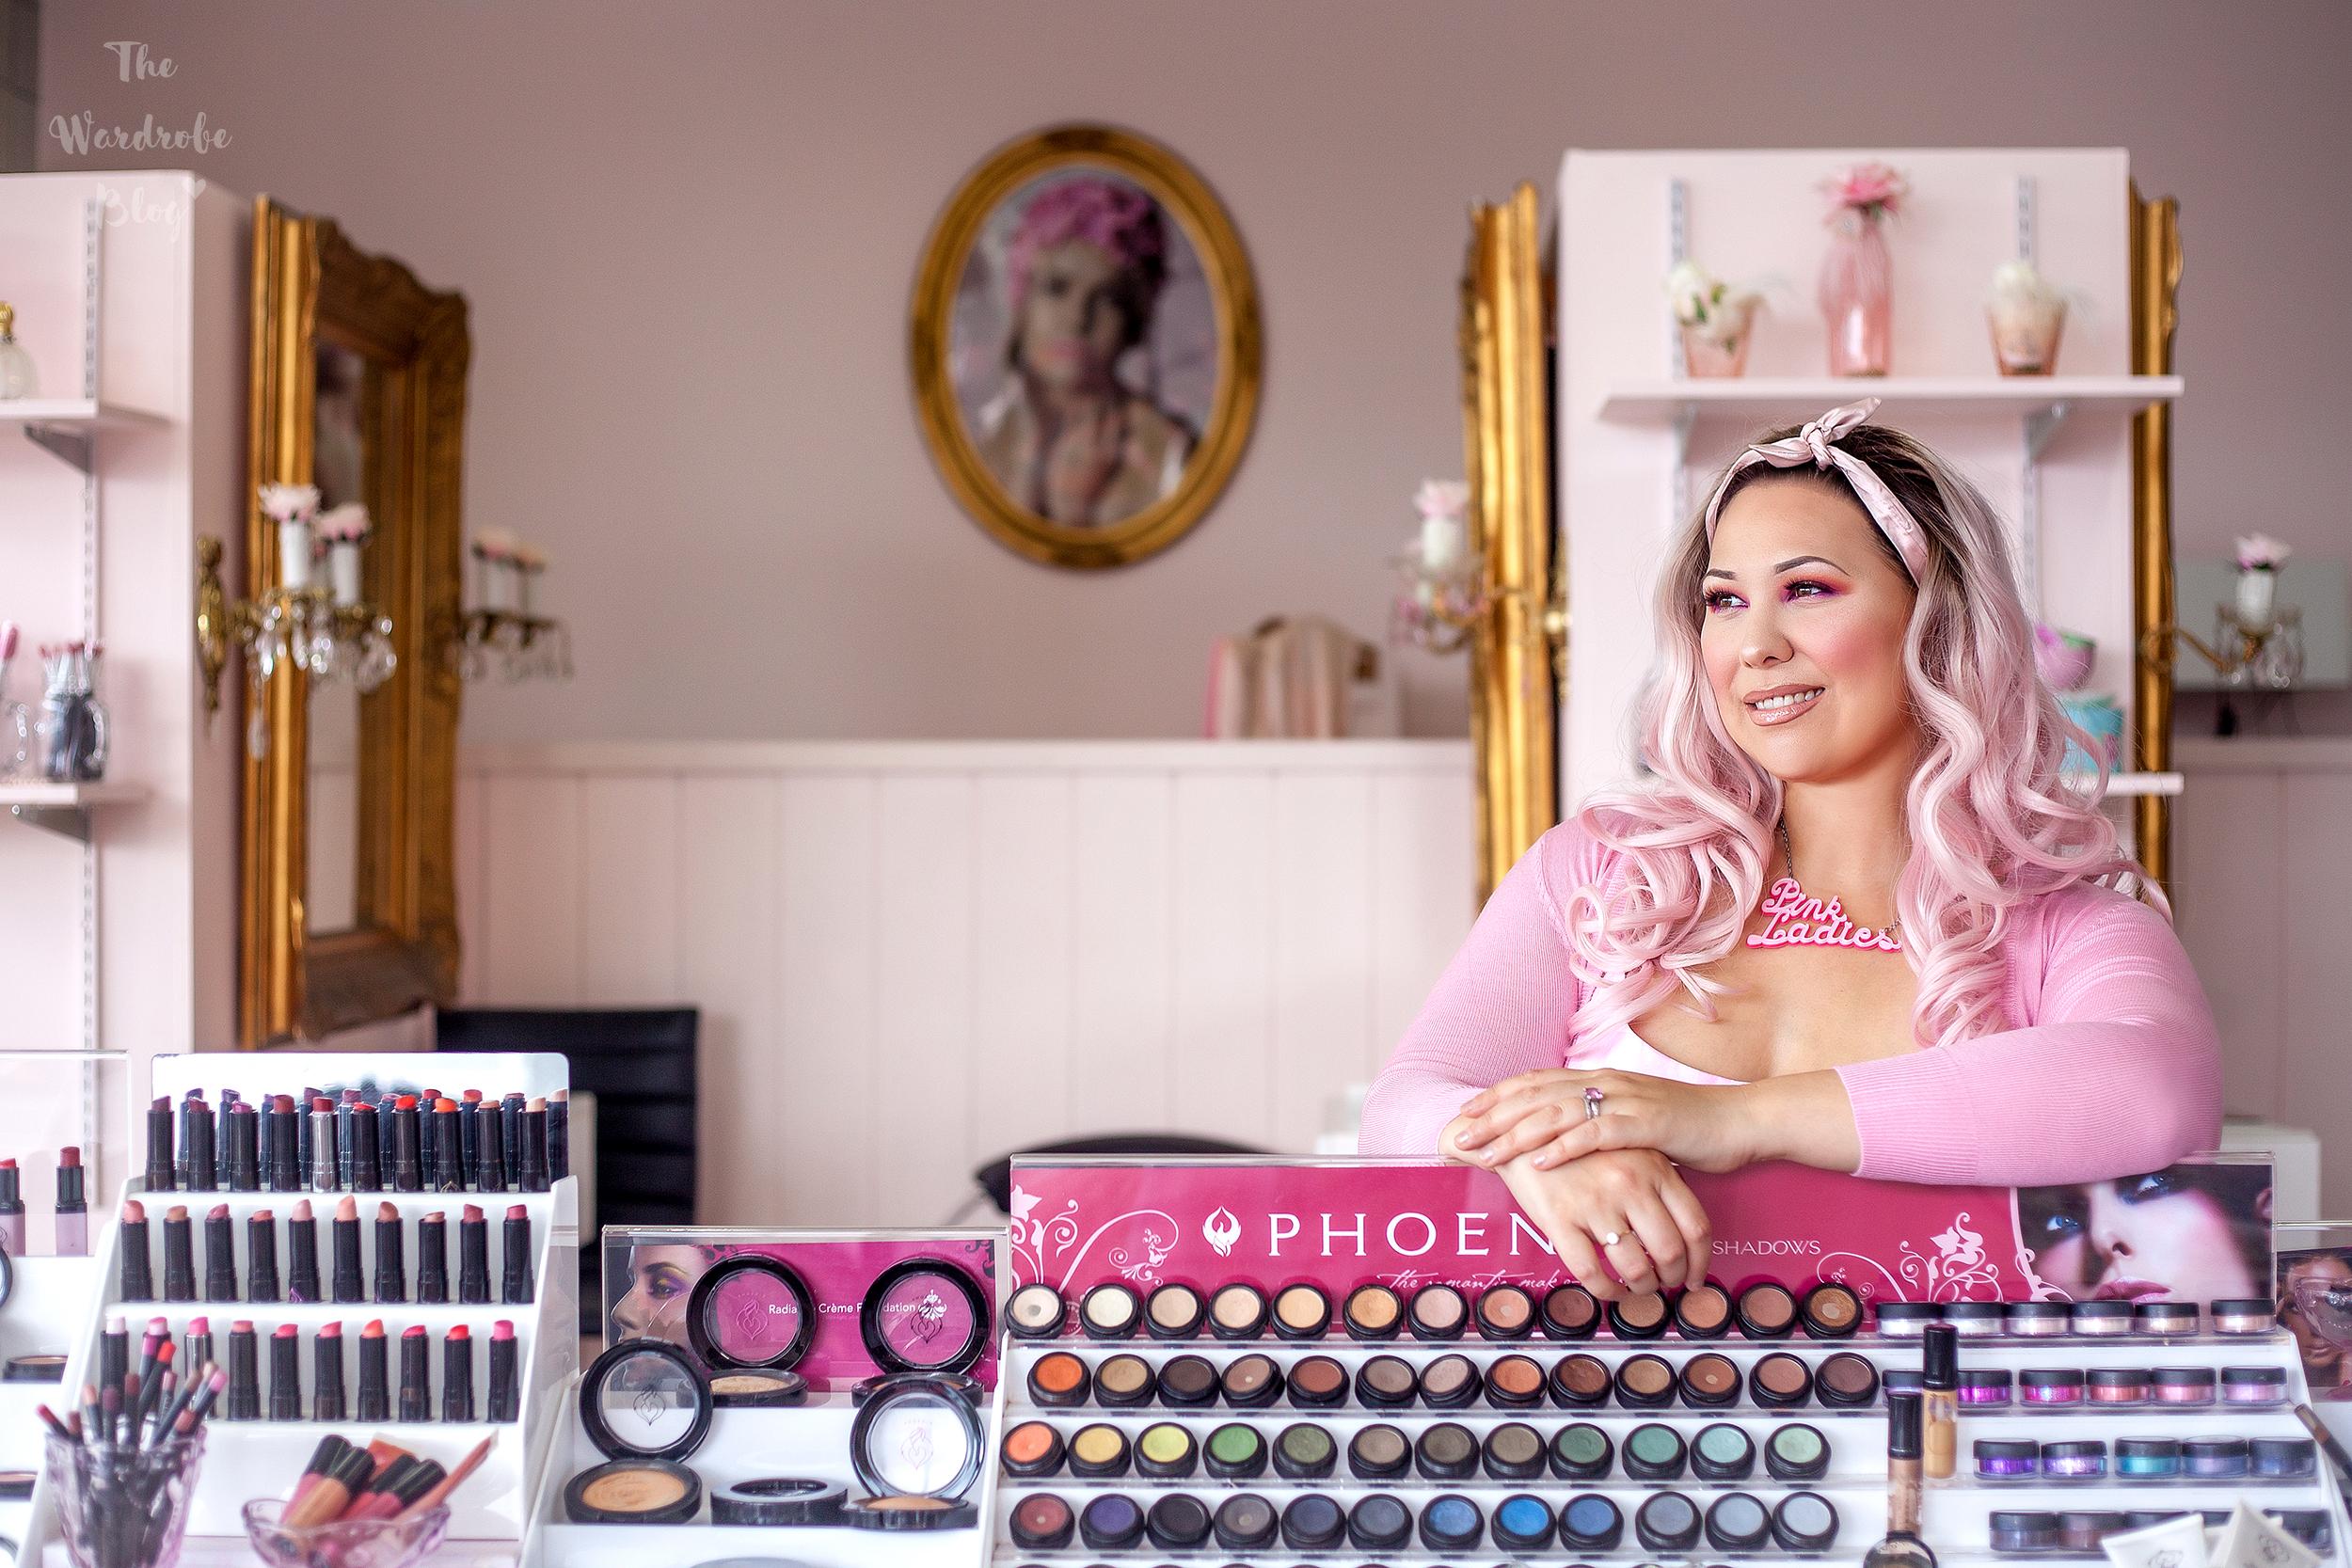 Snapchat Marilyn Renata nudes (26 photos), Ass, Paparazzi, Instagram, swimsuit 2006